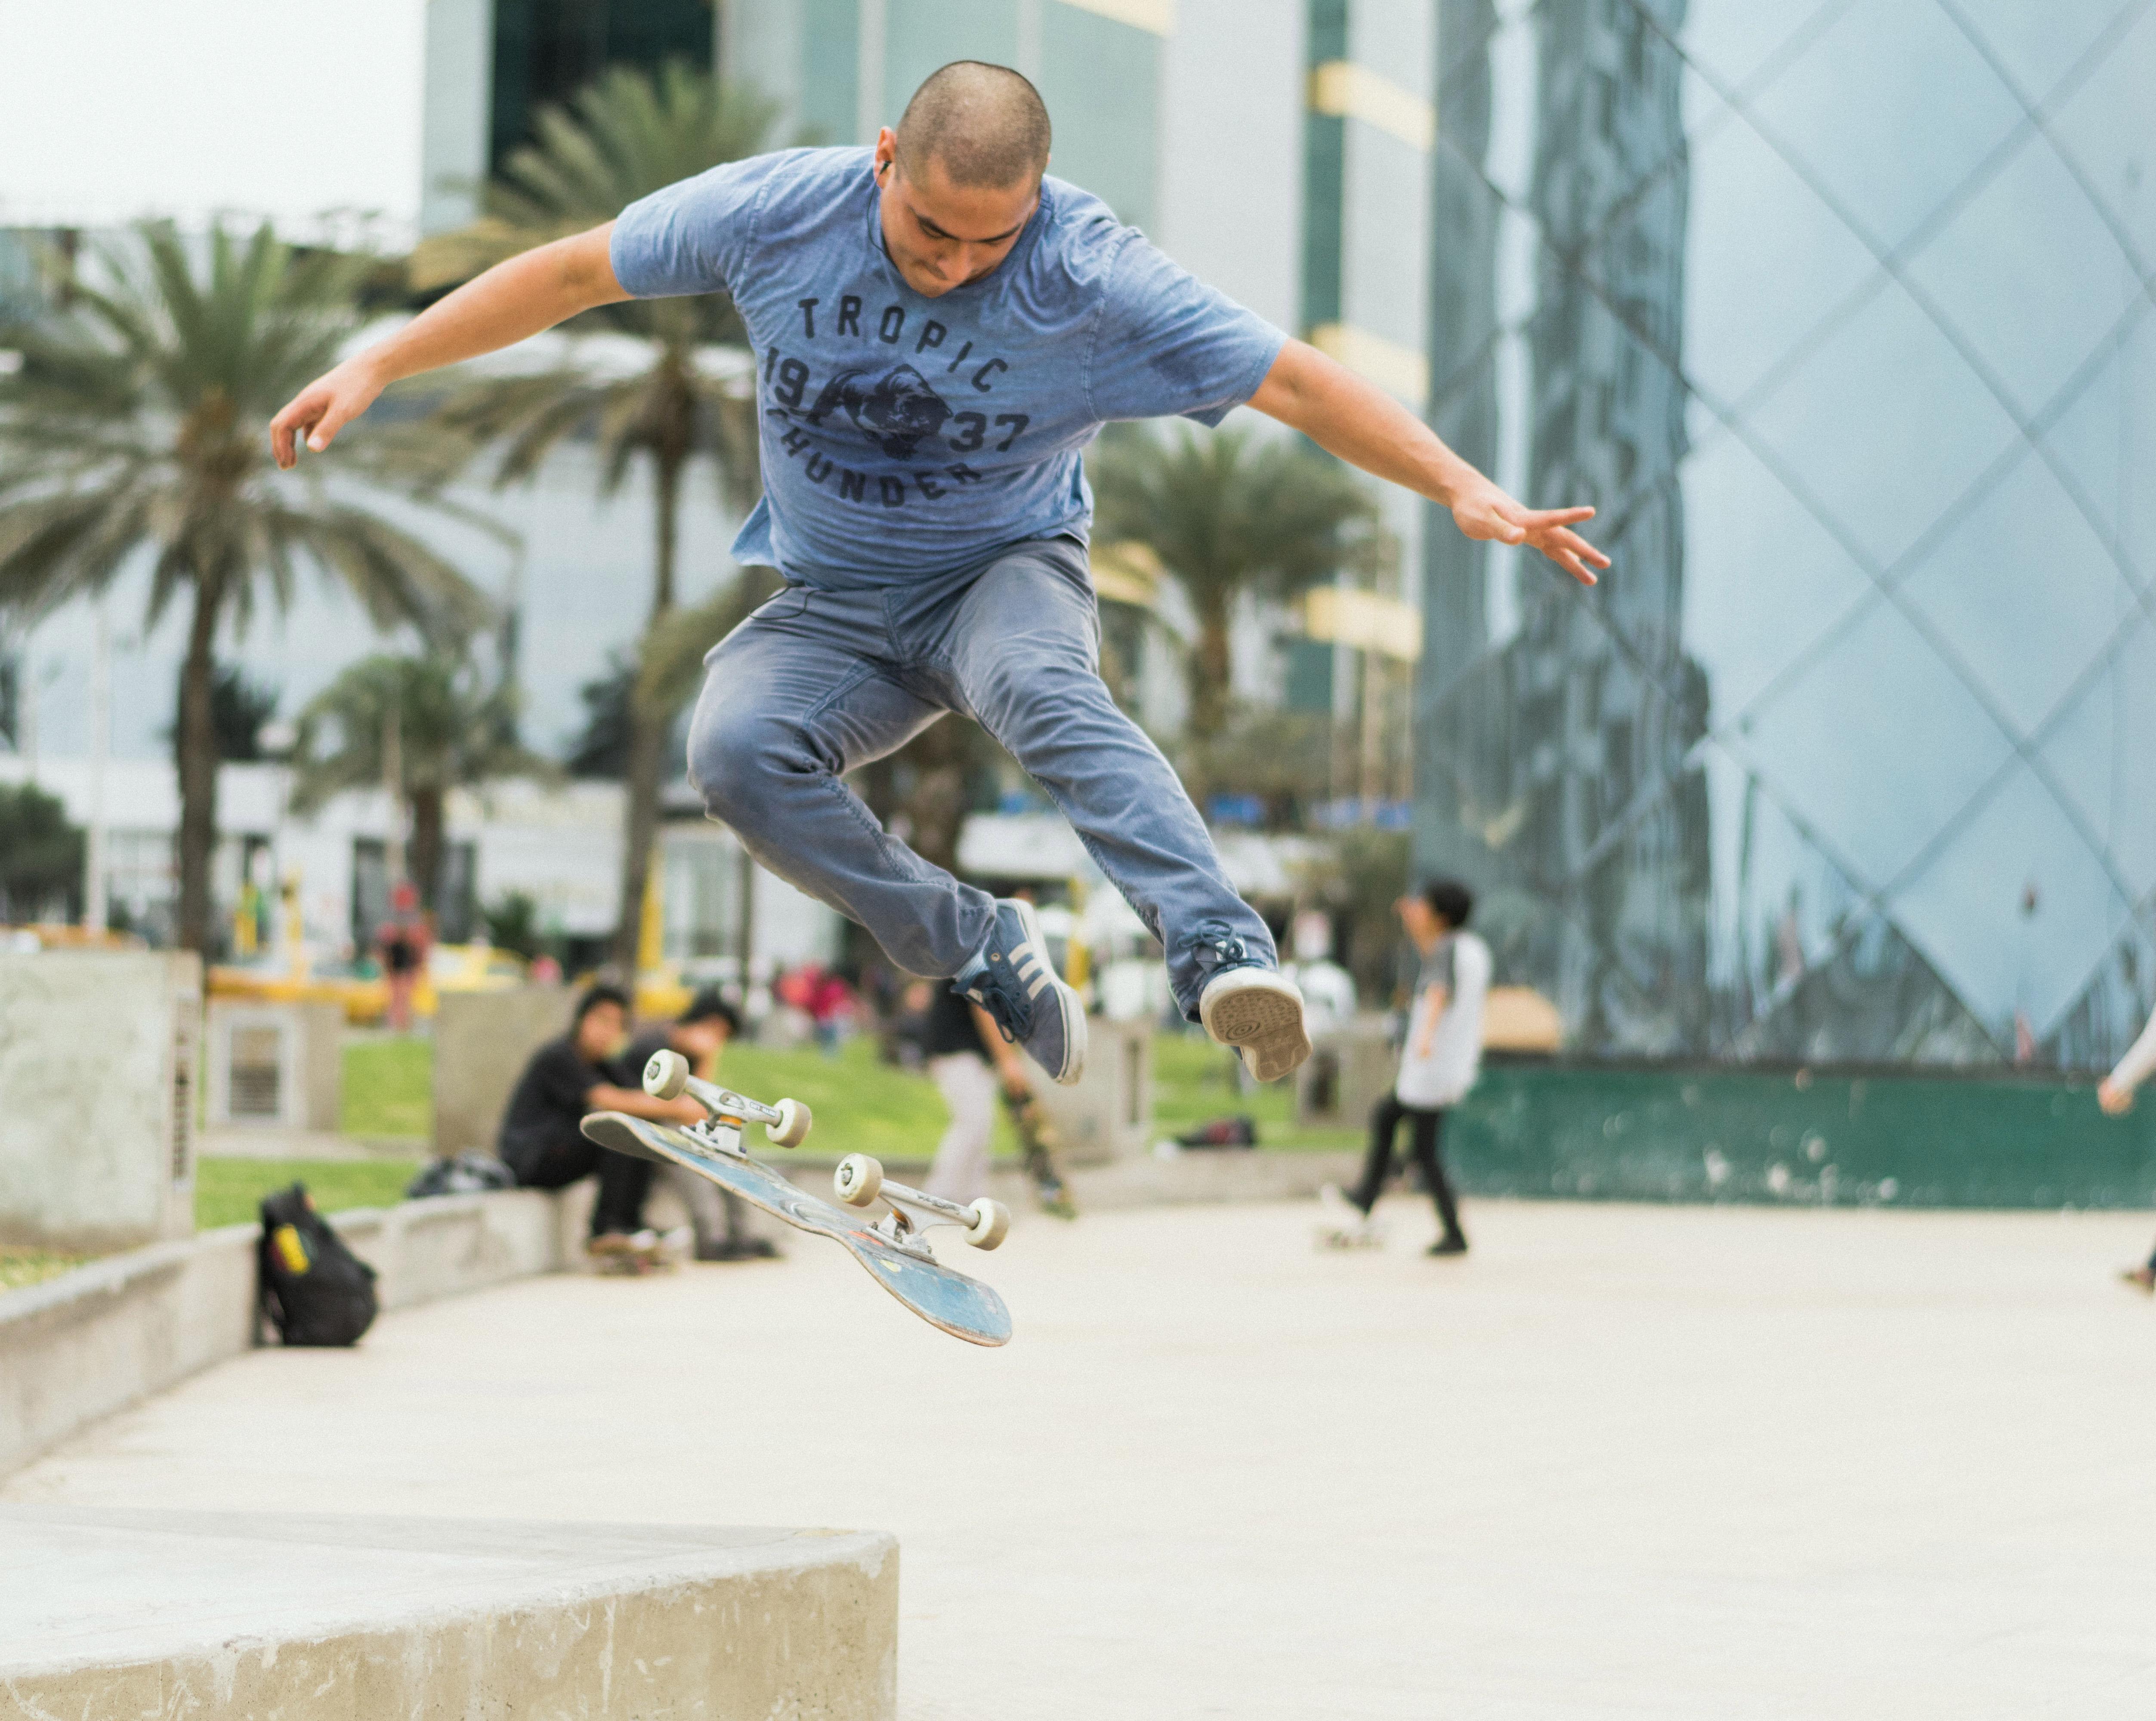 Skater, Skating, Skate, Human, People, HQ Photo